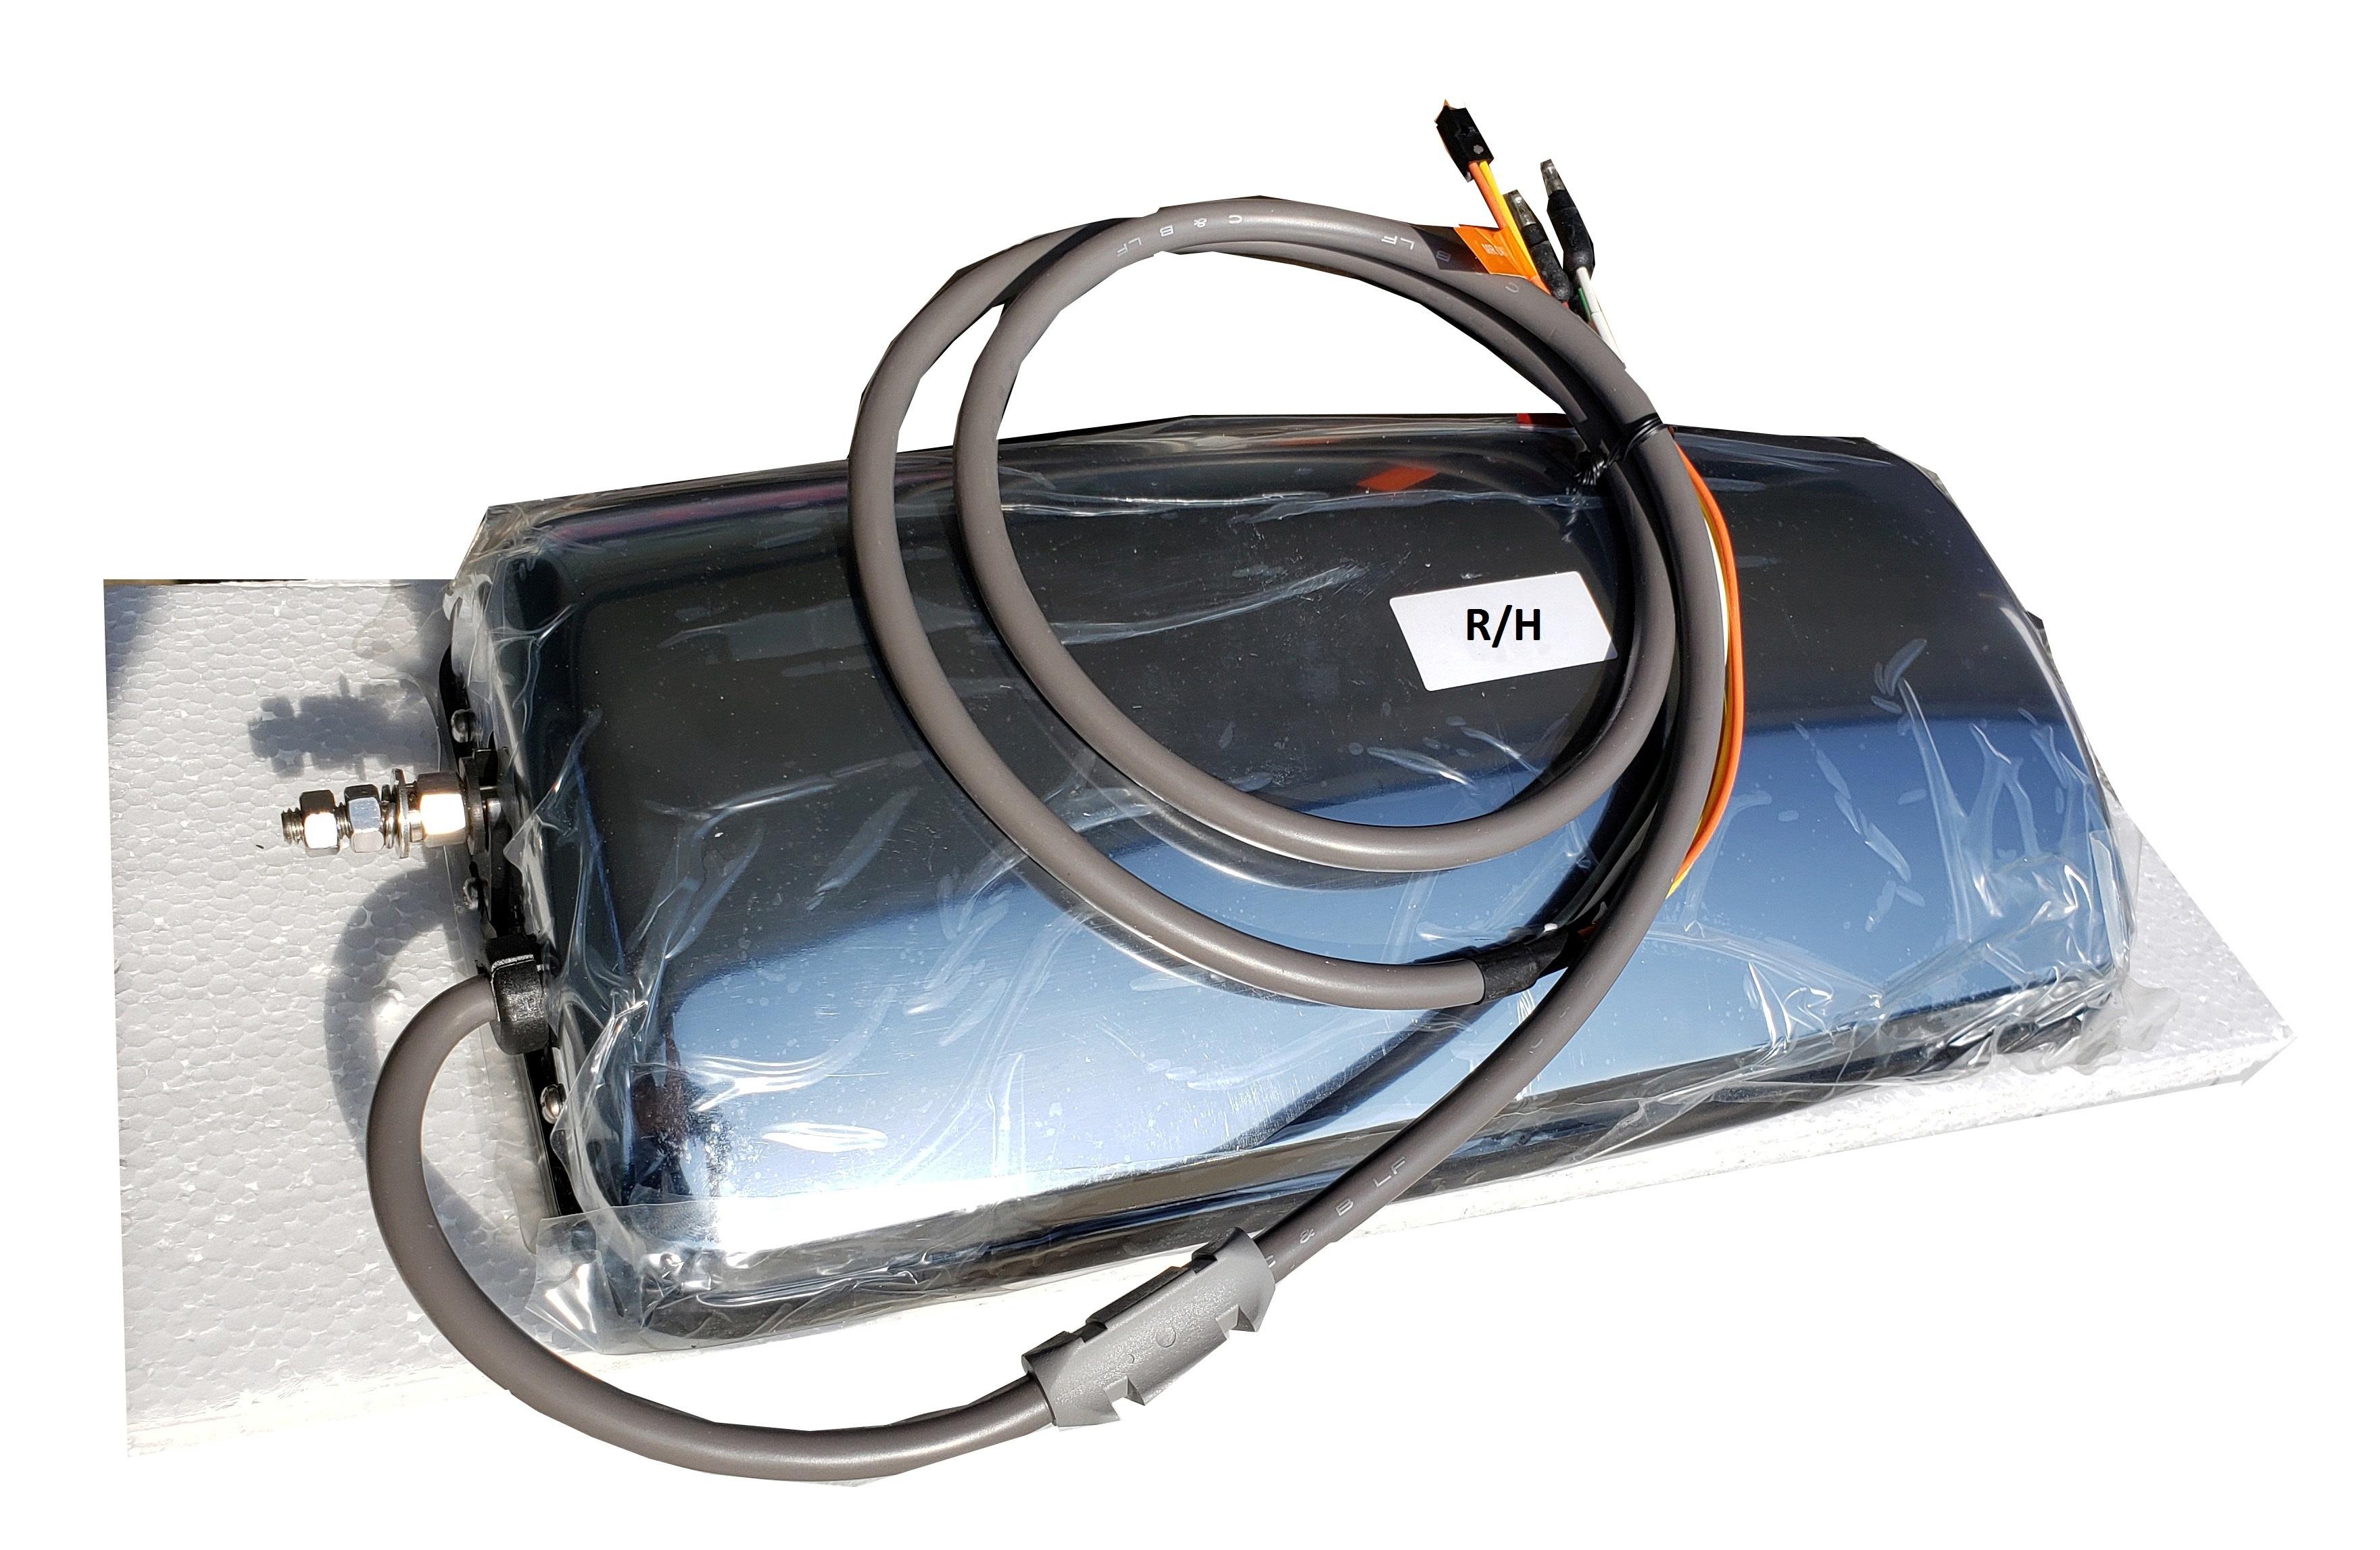 Peterbilt 389 Heated West Coast Motor Mirror w/ Oat Sensor (R/H)